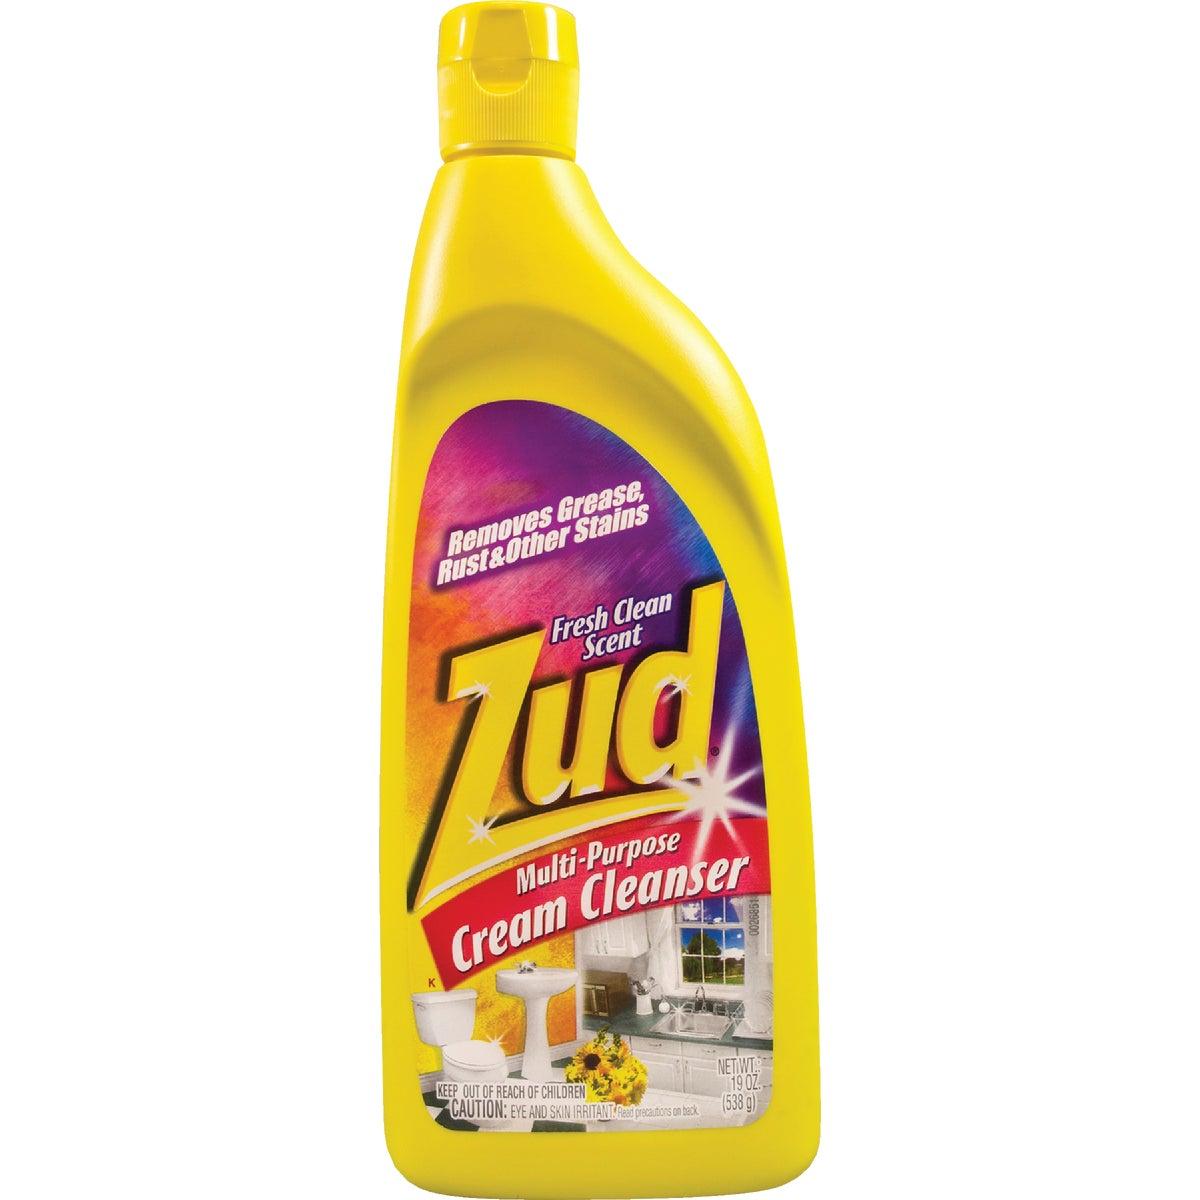 19Oz Cream Zud